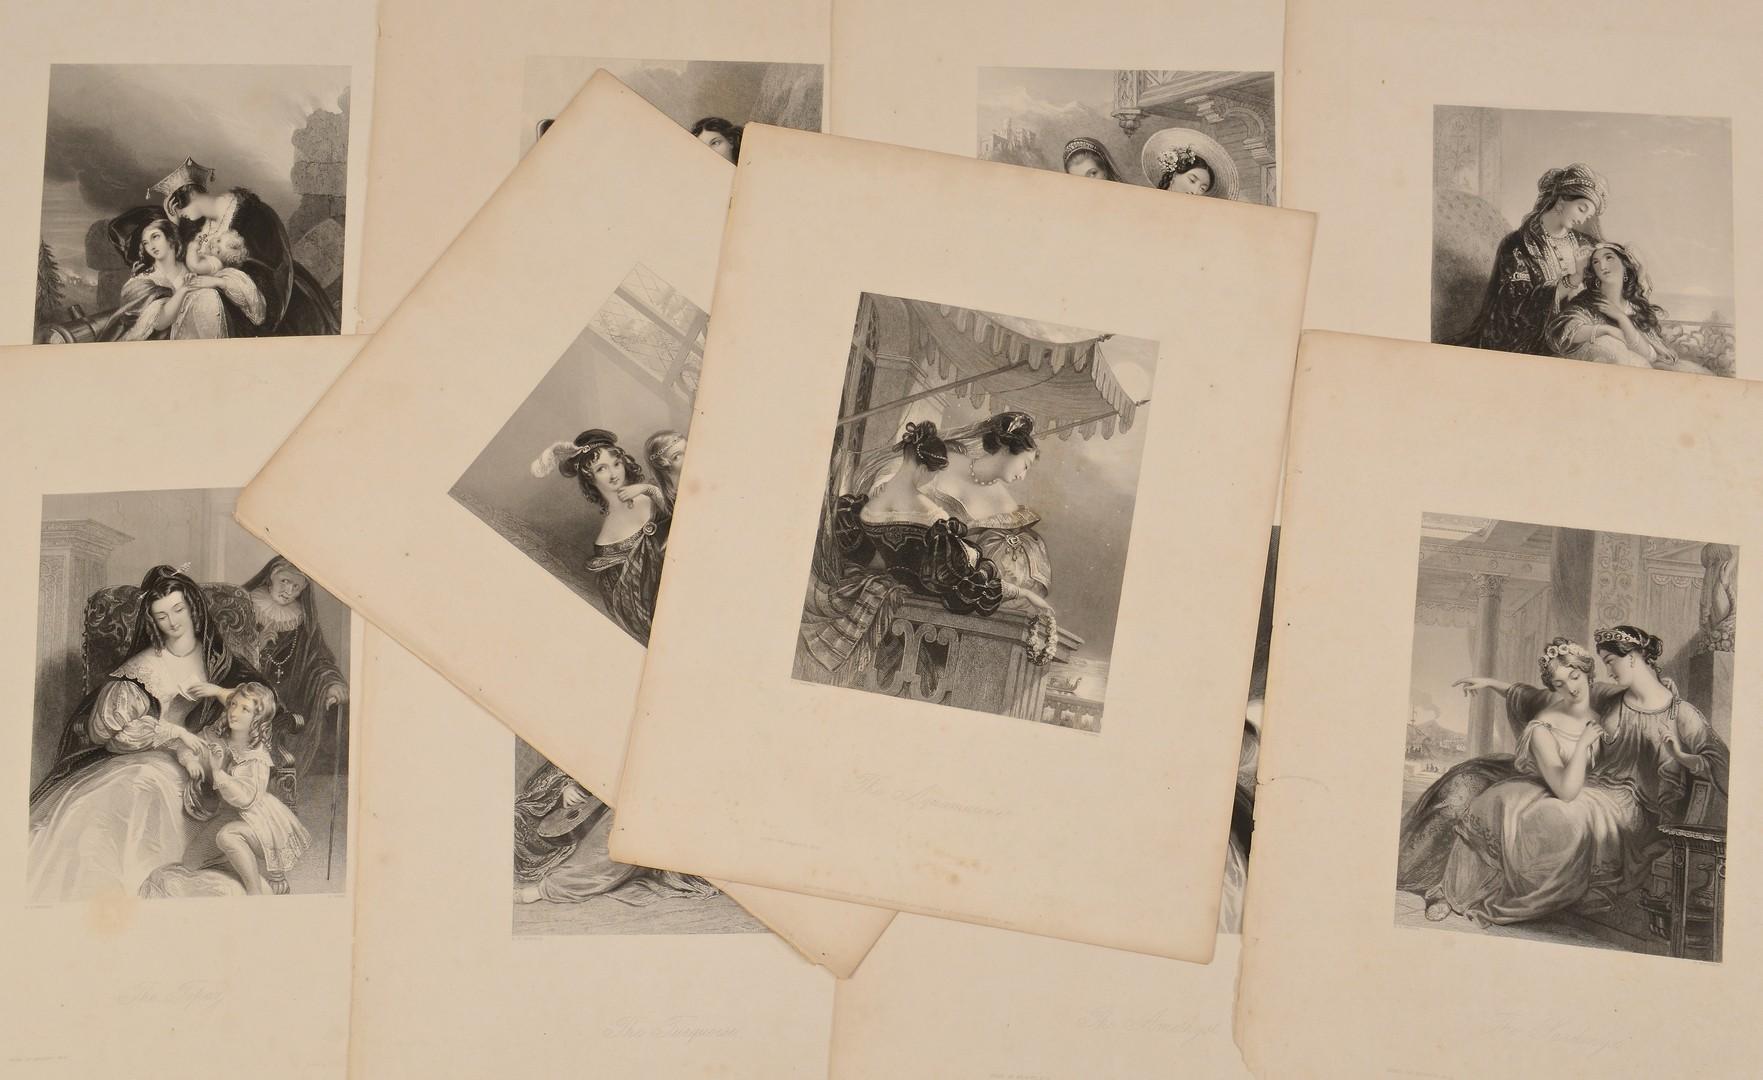 Lot 3832452: 32 Assorted Prints